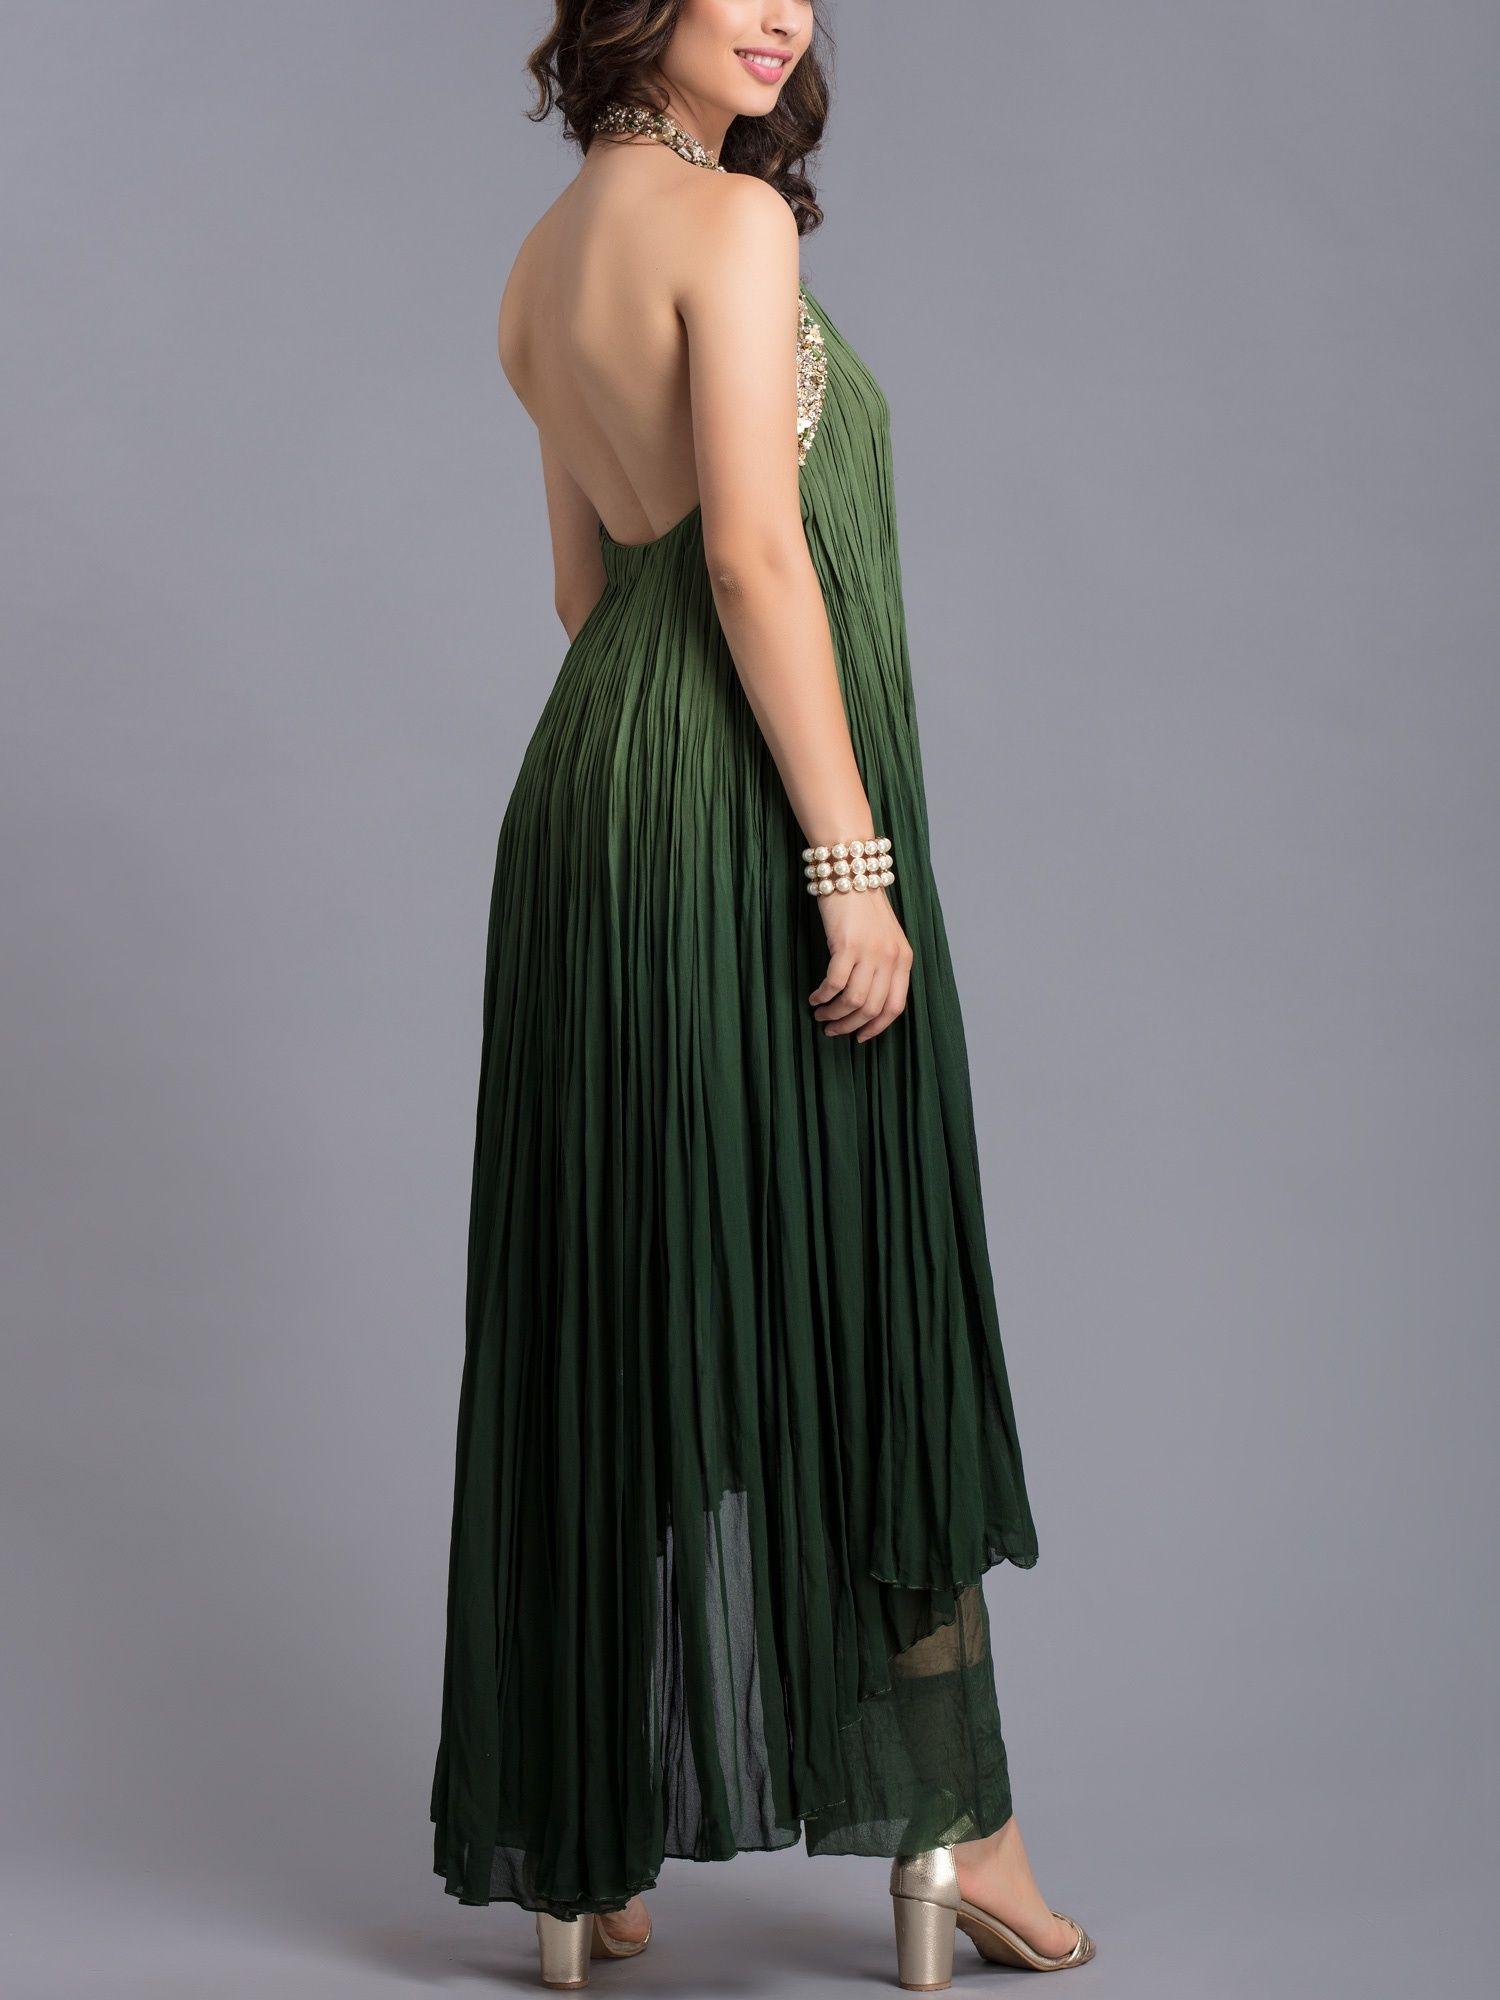 26c9f414727 Avdi Kurtis Kurtas and Tunics : Buy Avdi Olive Green Halter Neck ...